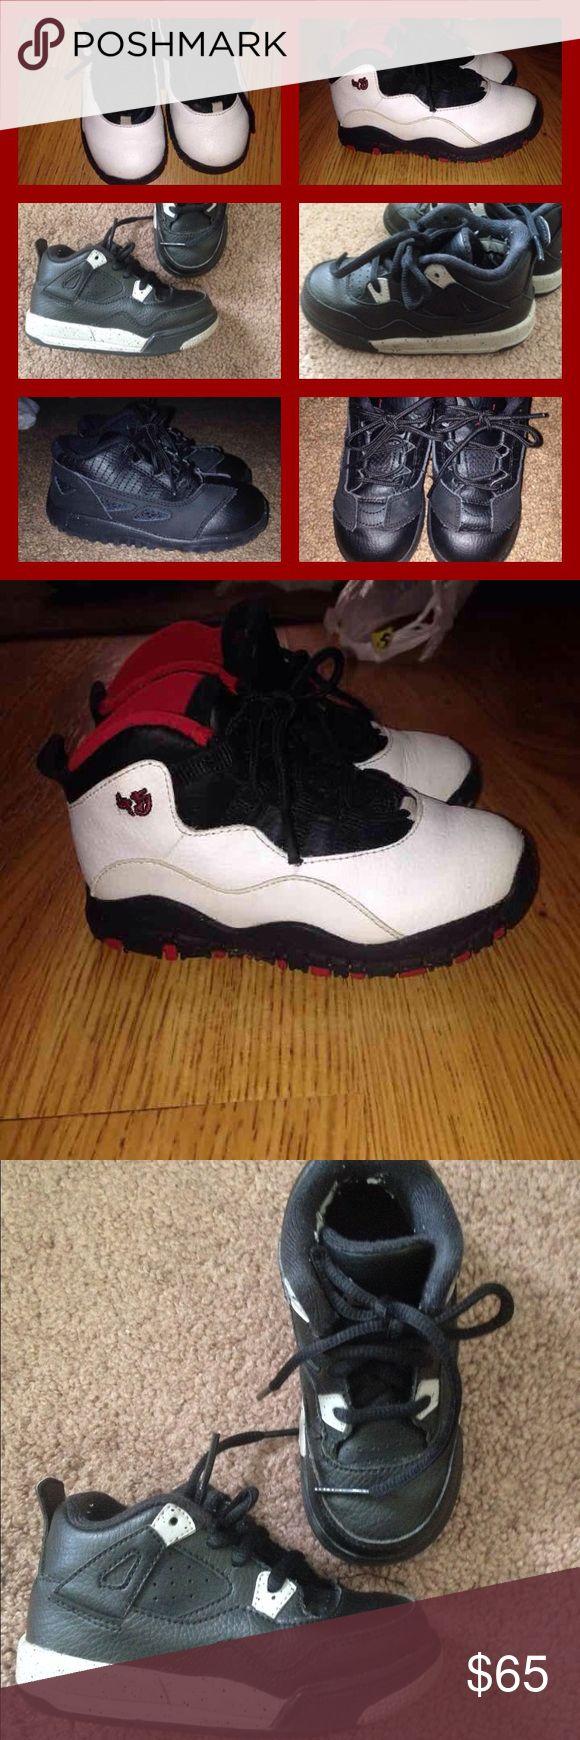 Jordan bundle sz 8/9c Black Jordan Xs sz 9c Black Jordan Oreos 8c Black Jordan 11s sz 8c  All great condition Jordan Shoes Sneakers